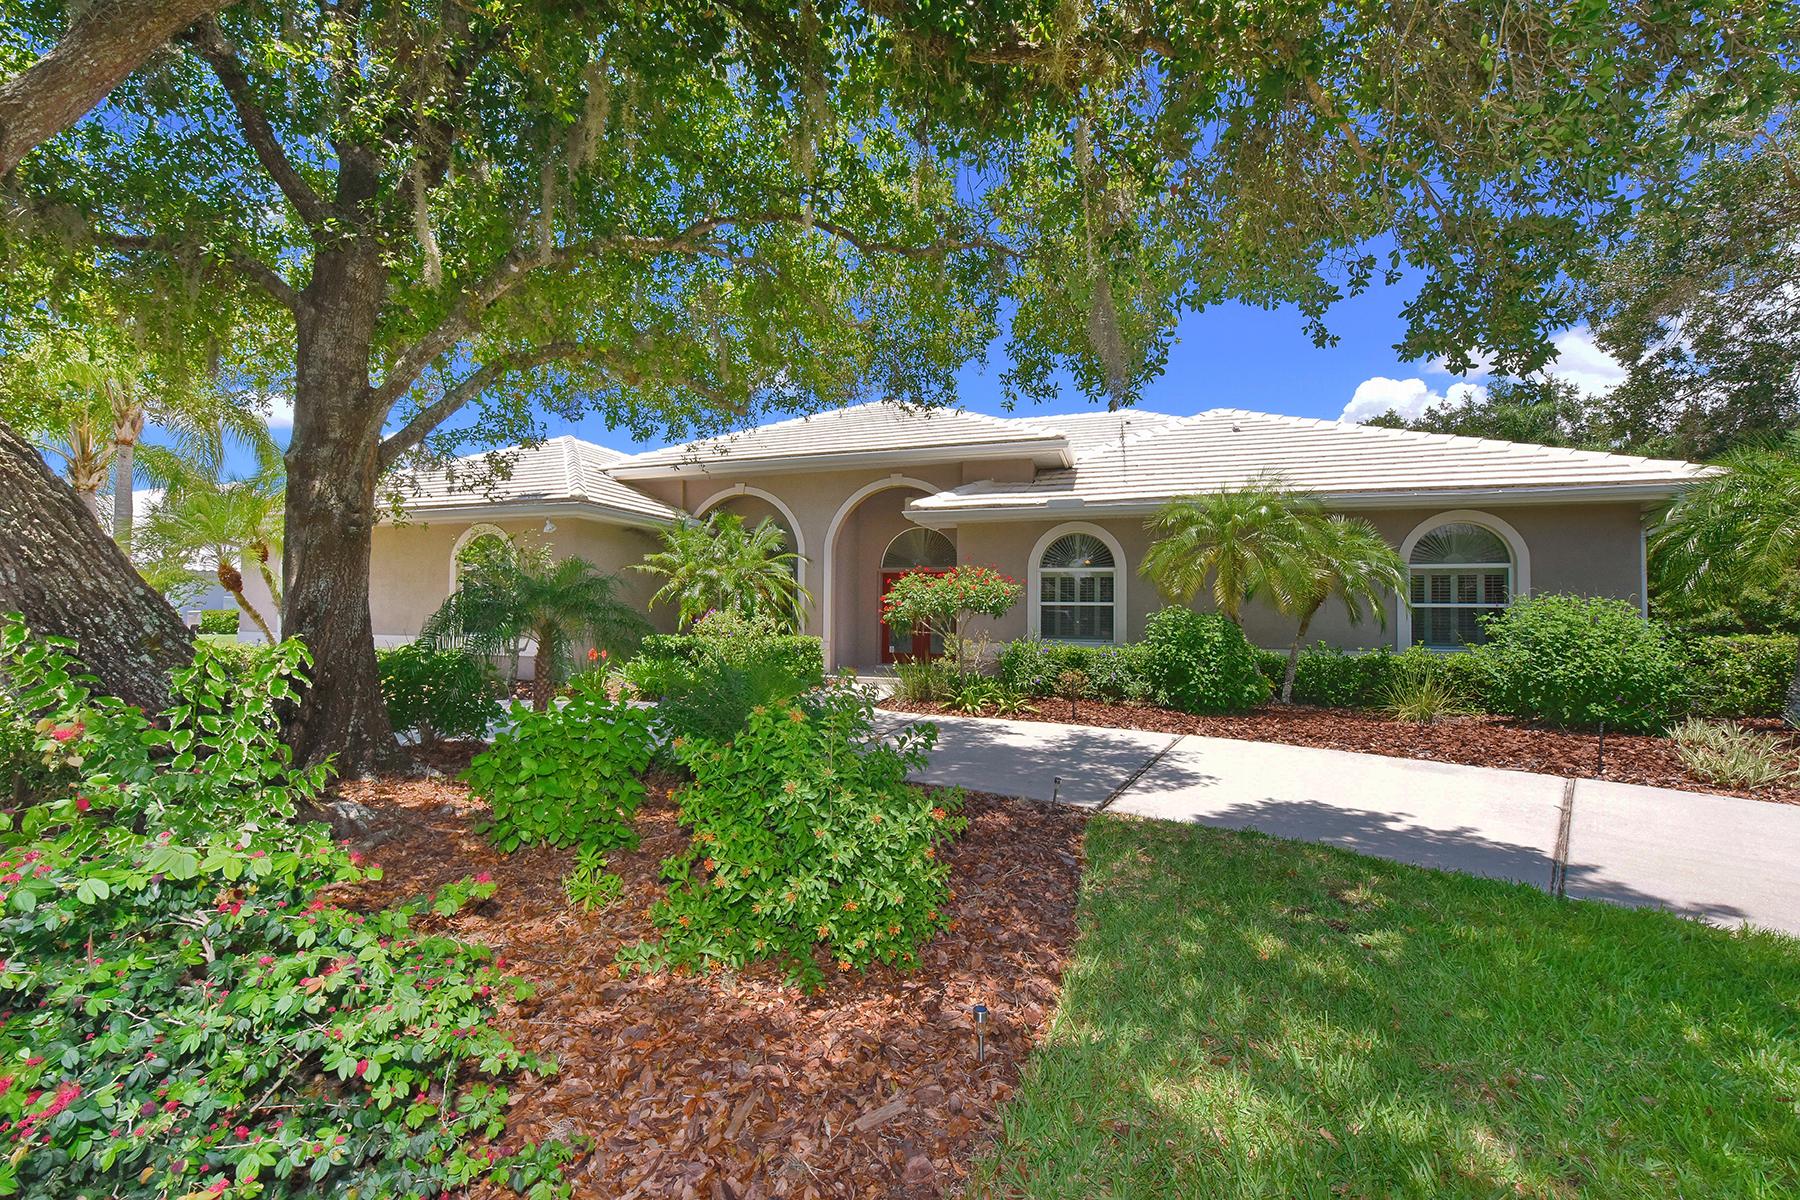 Single Family Home for Sale at LAUREL OAK 7724 Alister Mackenzie Dr Sarasota, Florida 34240 United States